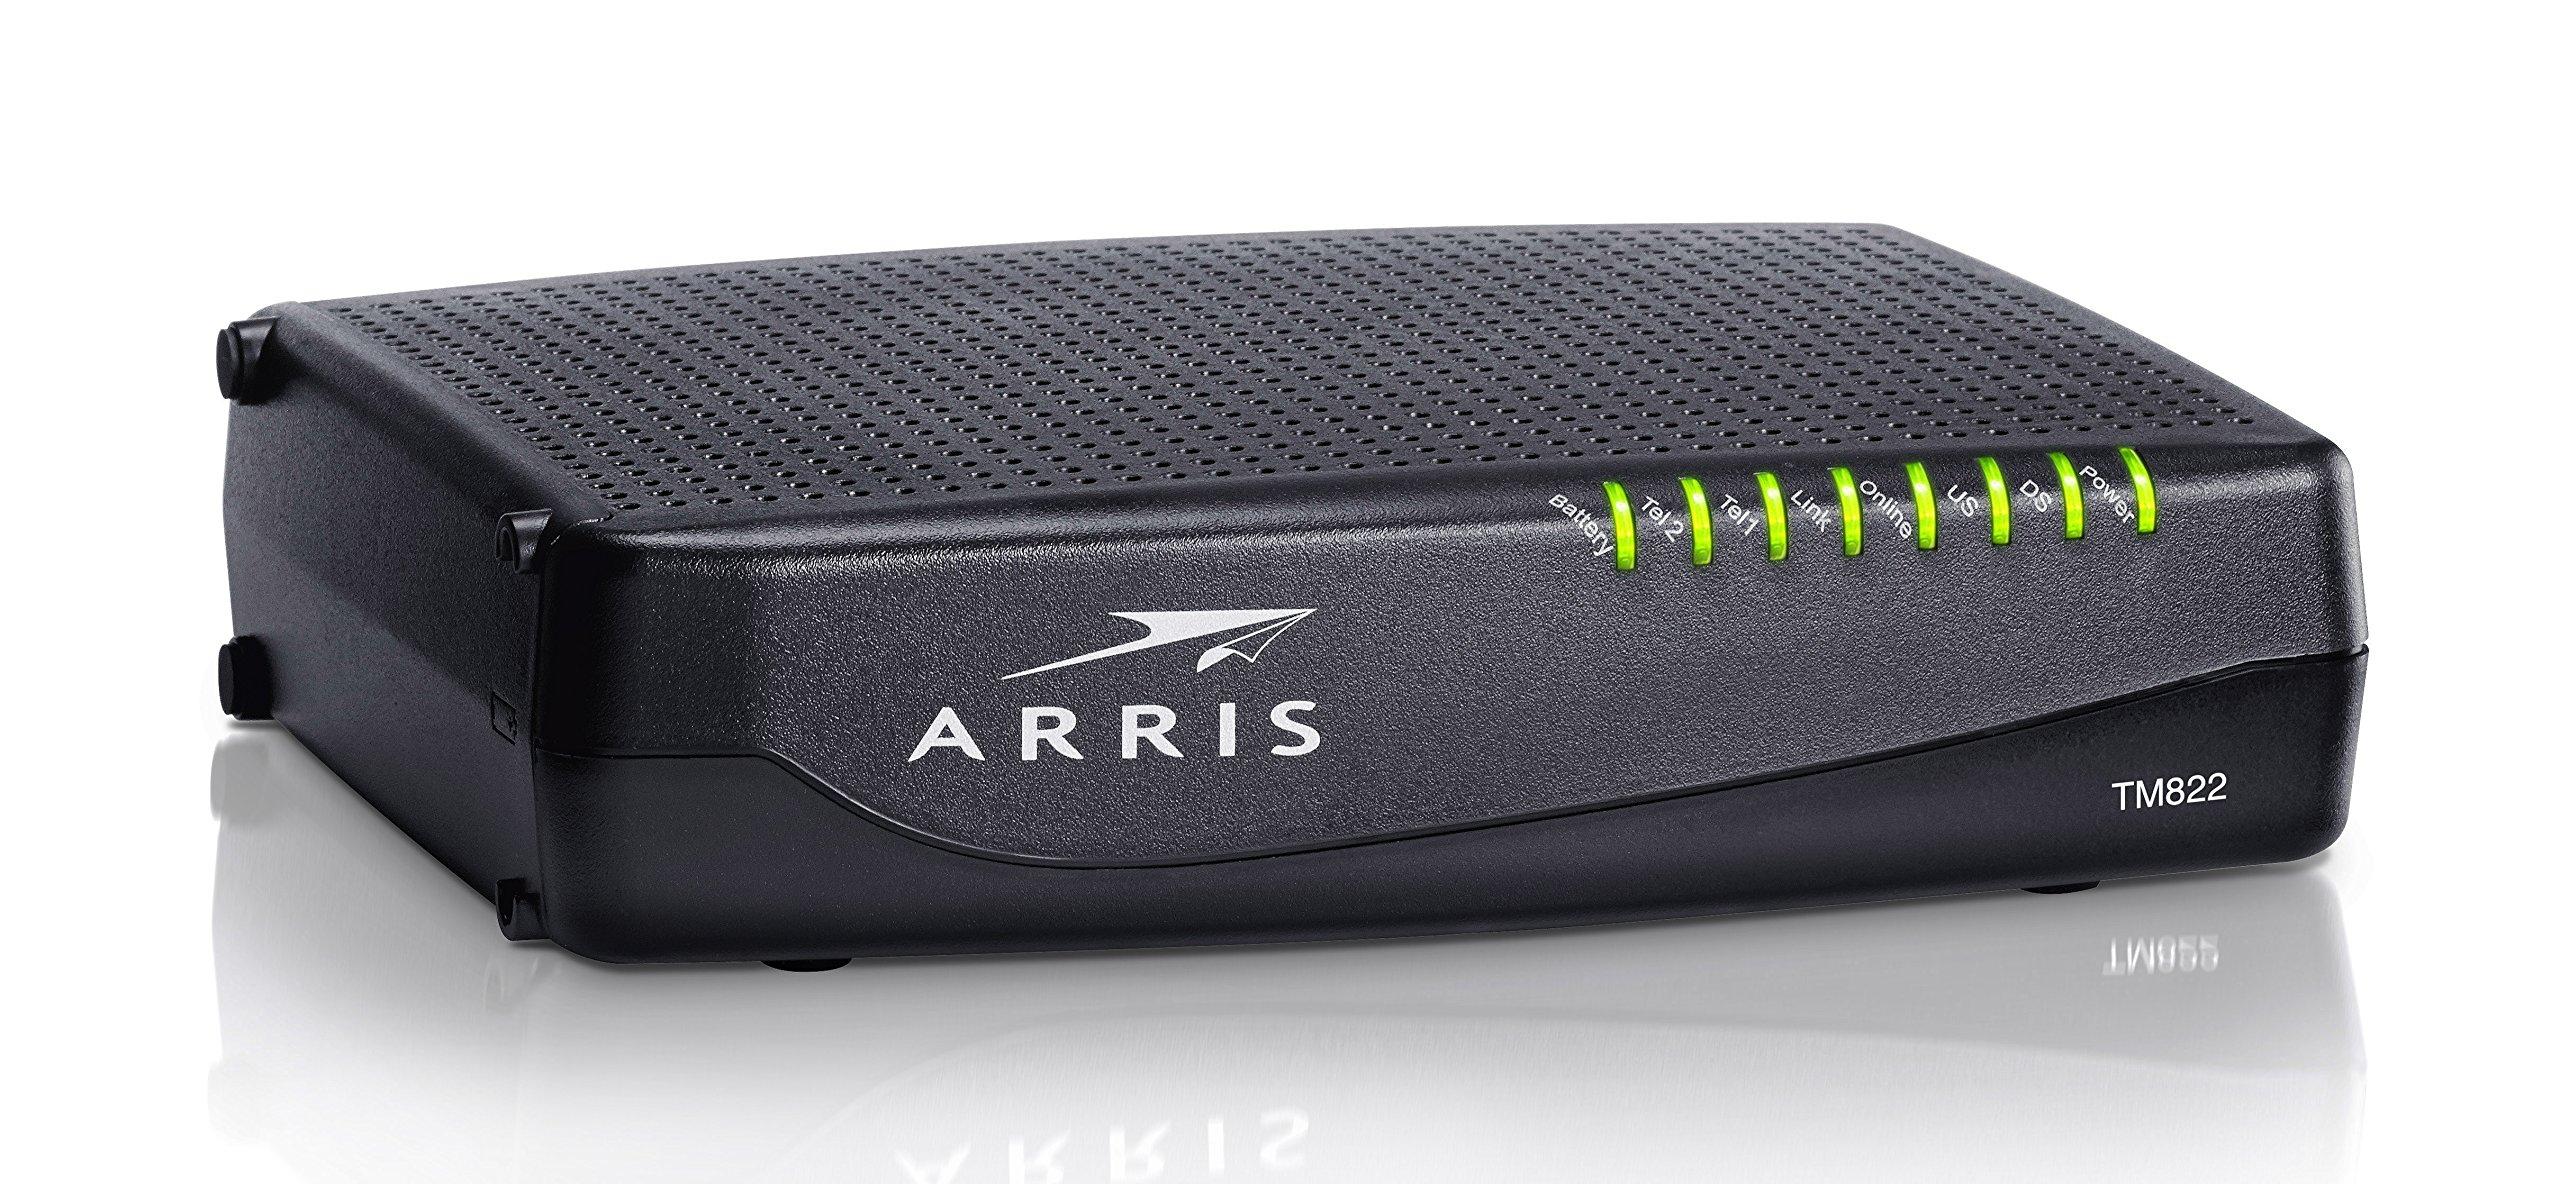 Openbox Arris Touchstone Tm822g Internet Voice Modem For